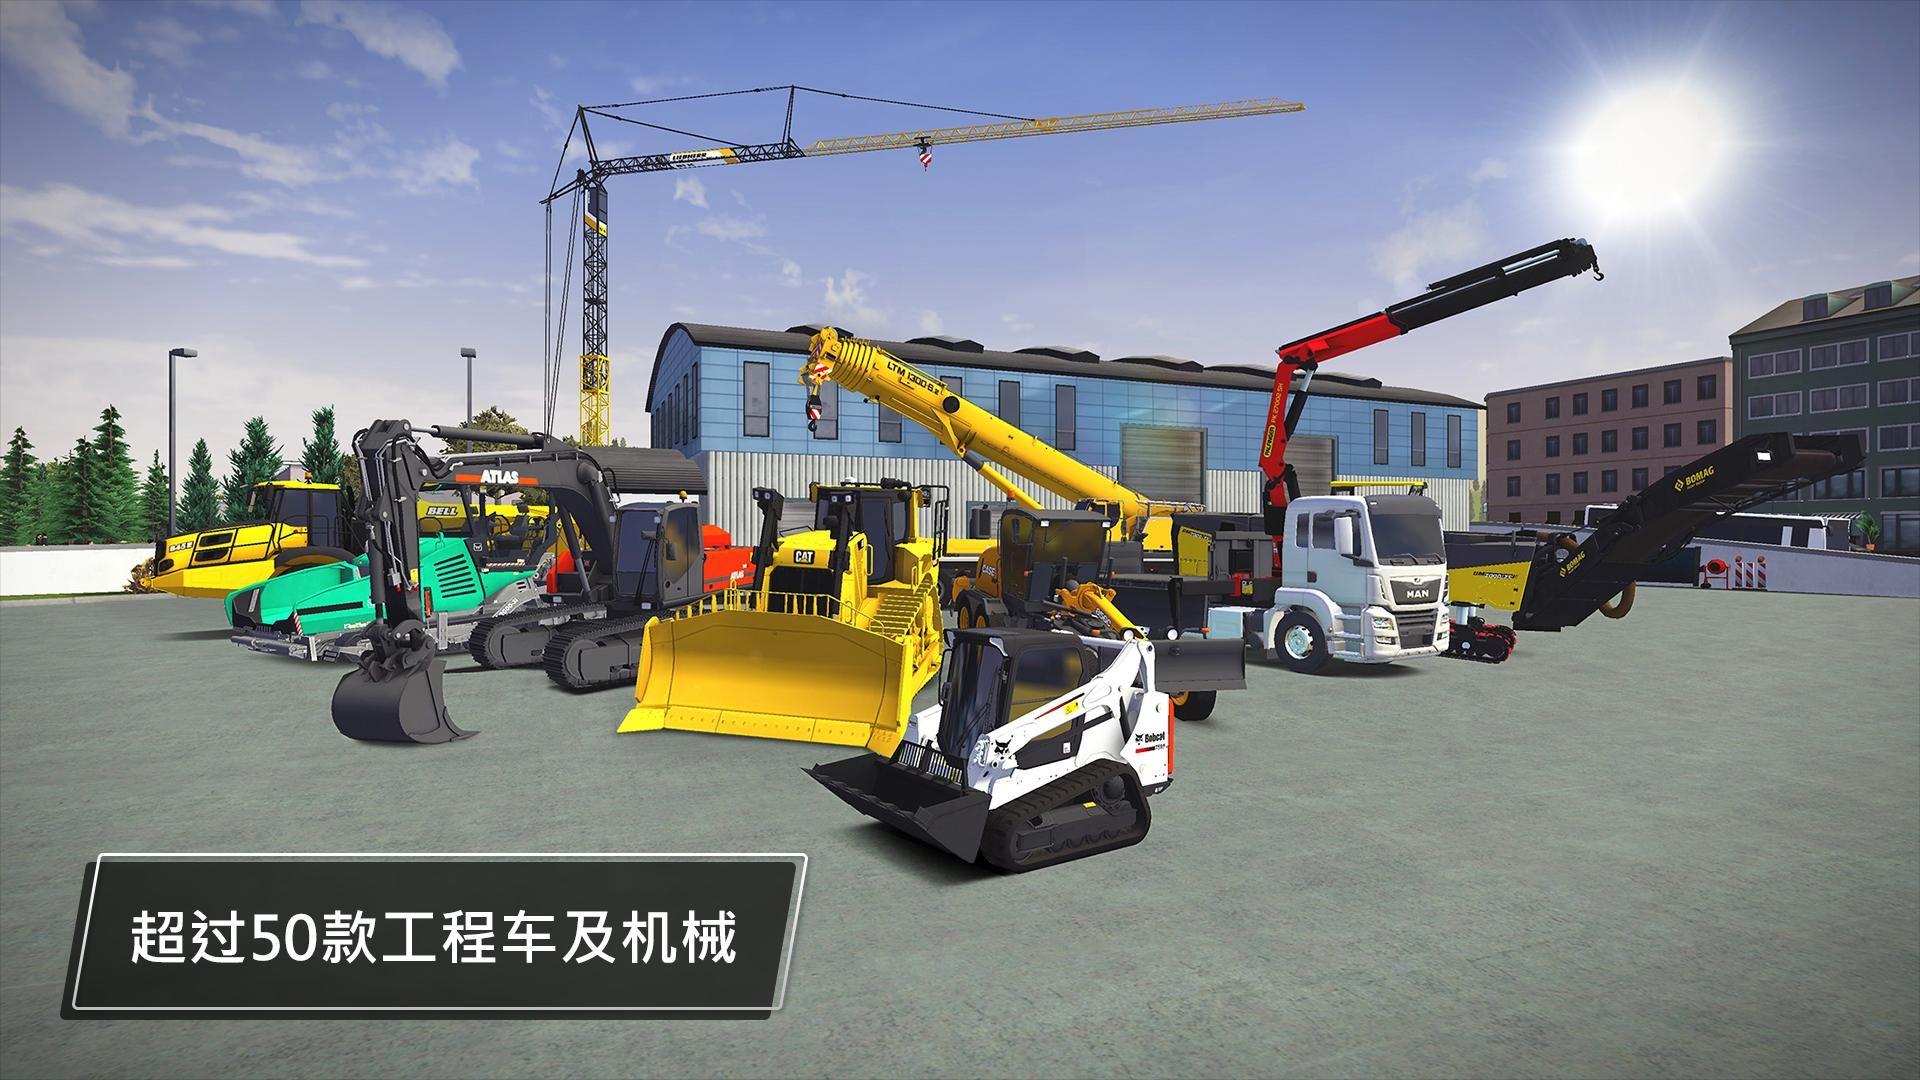 模拟建设 3(Construction Simulator 3) 游戏截图1